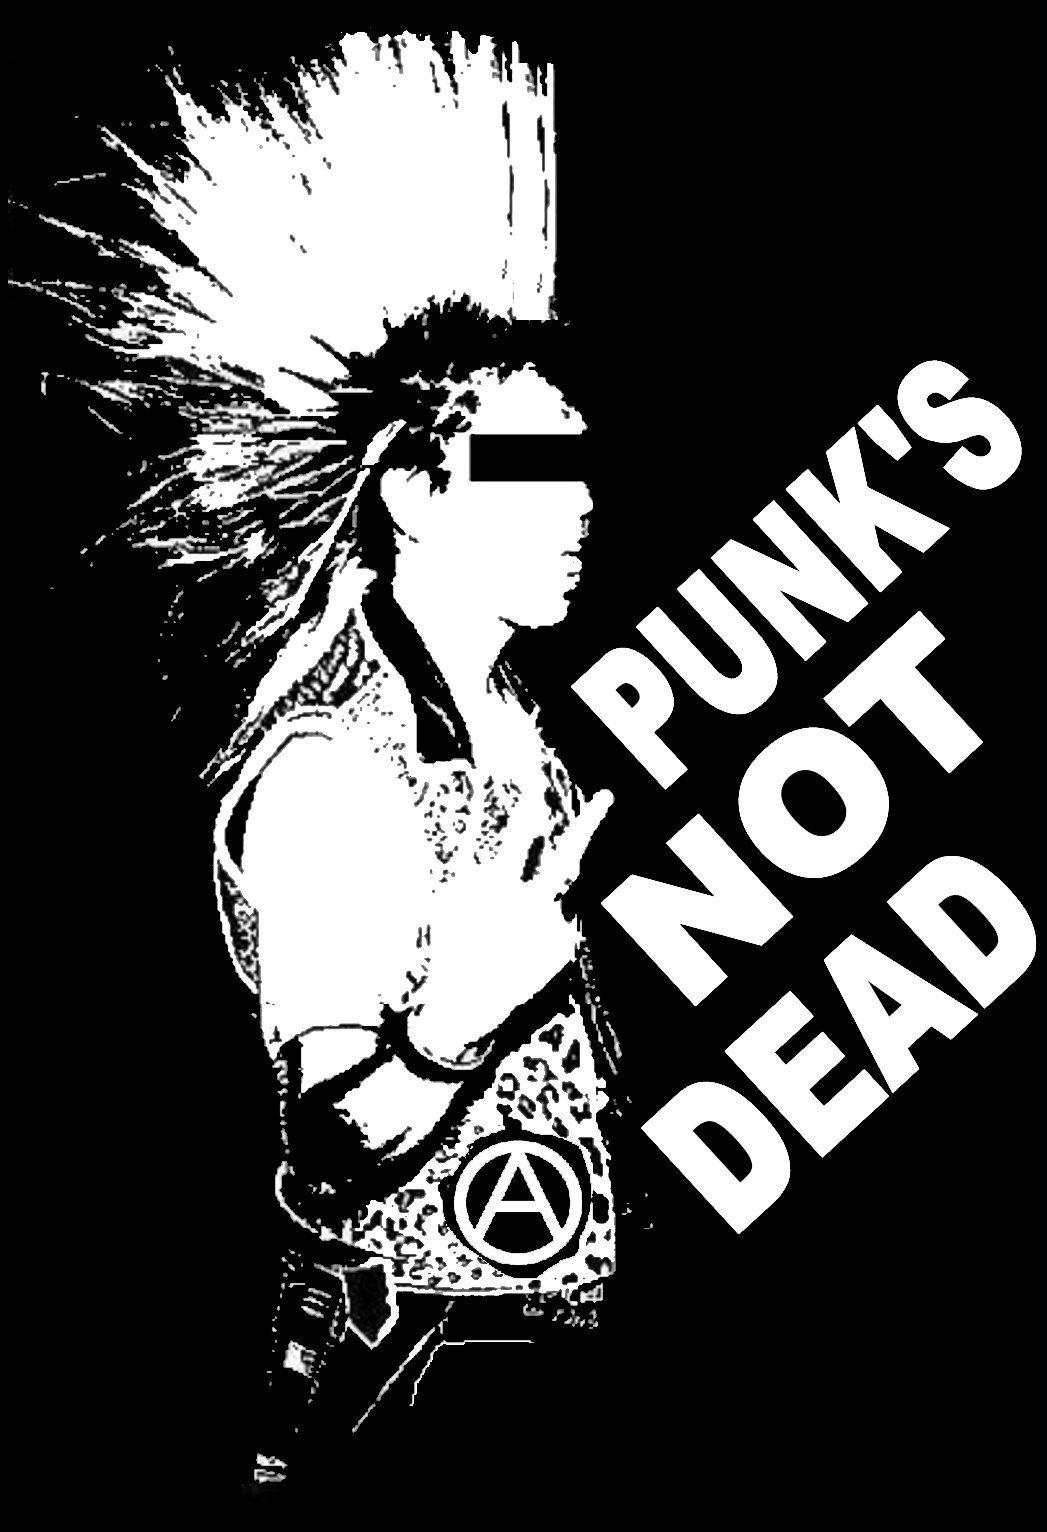 Pin By Redstar73 Records On Punx Punk Culture Punks Not Dead Punk Rock